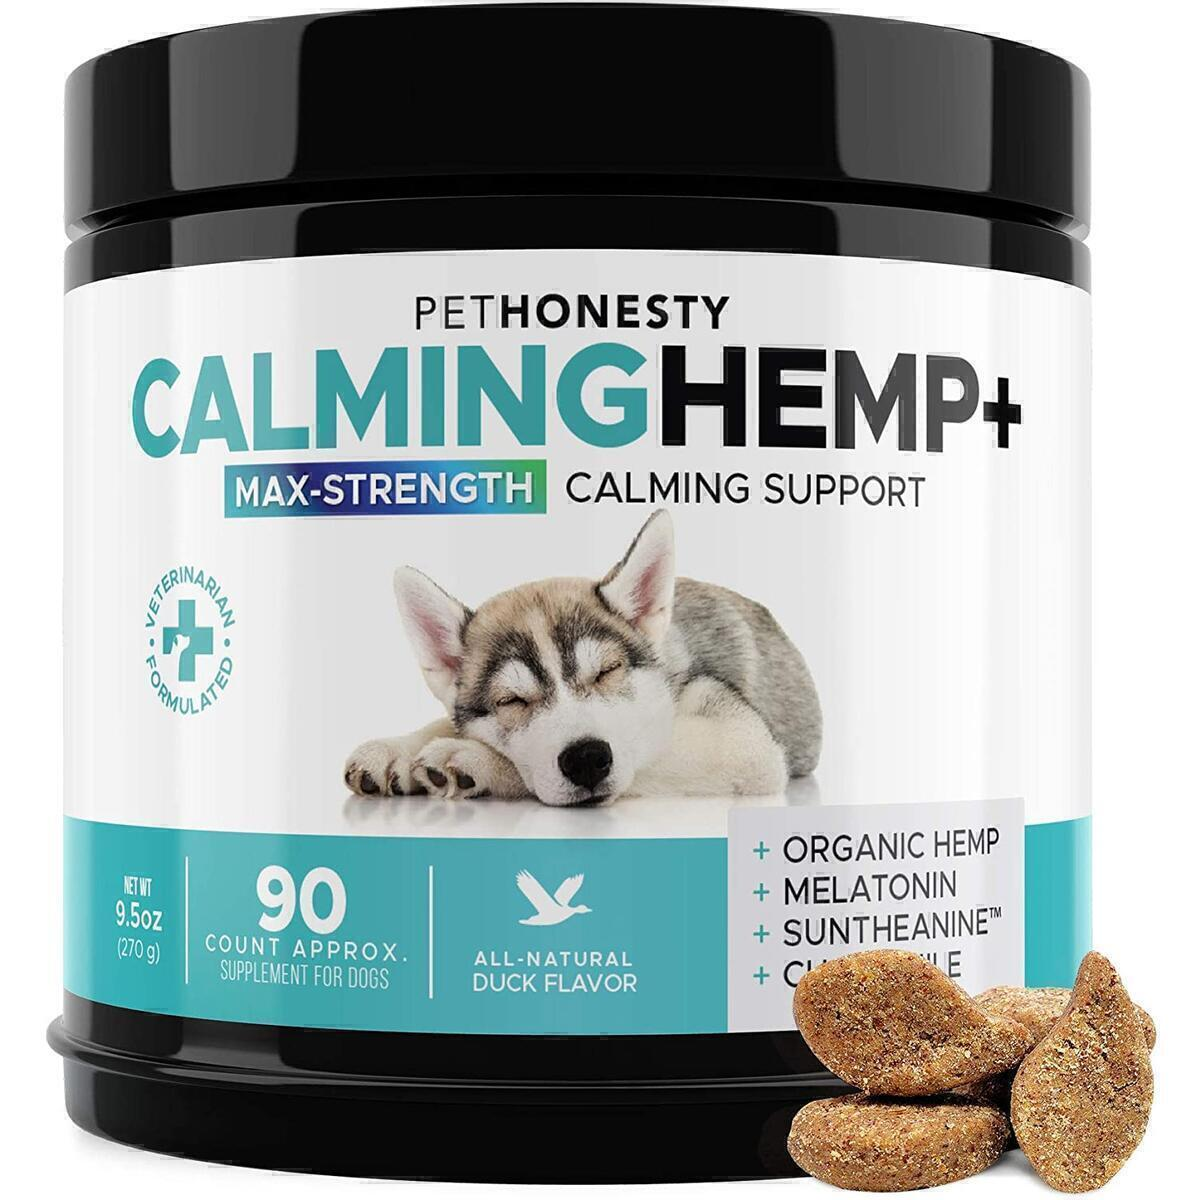 PetHonesty Calming Hemp + (Maximum Strength Calming Support)